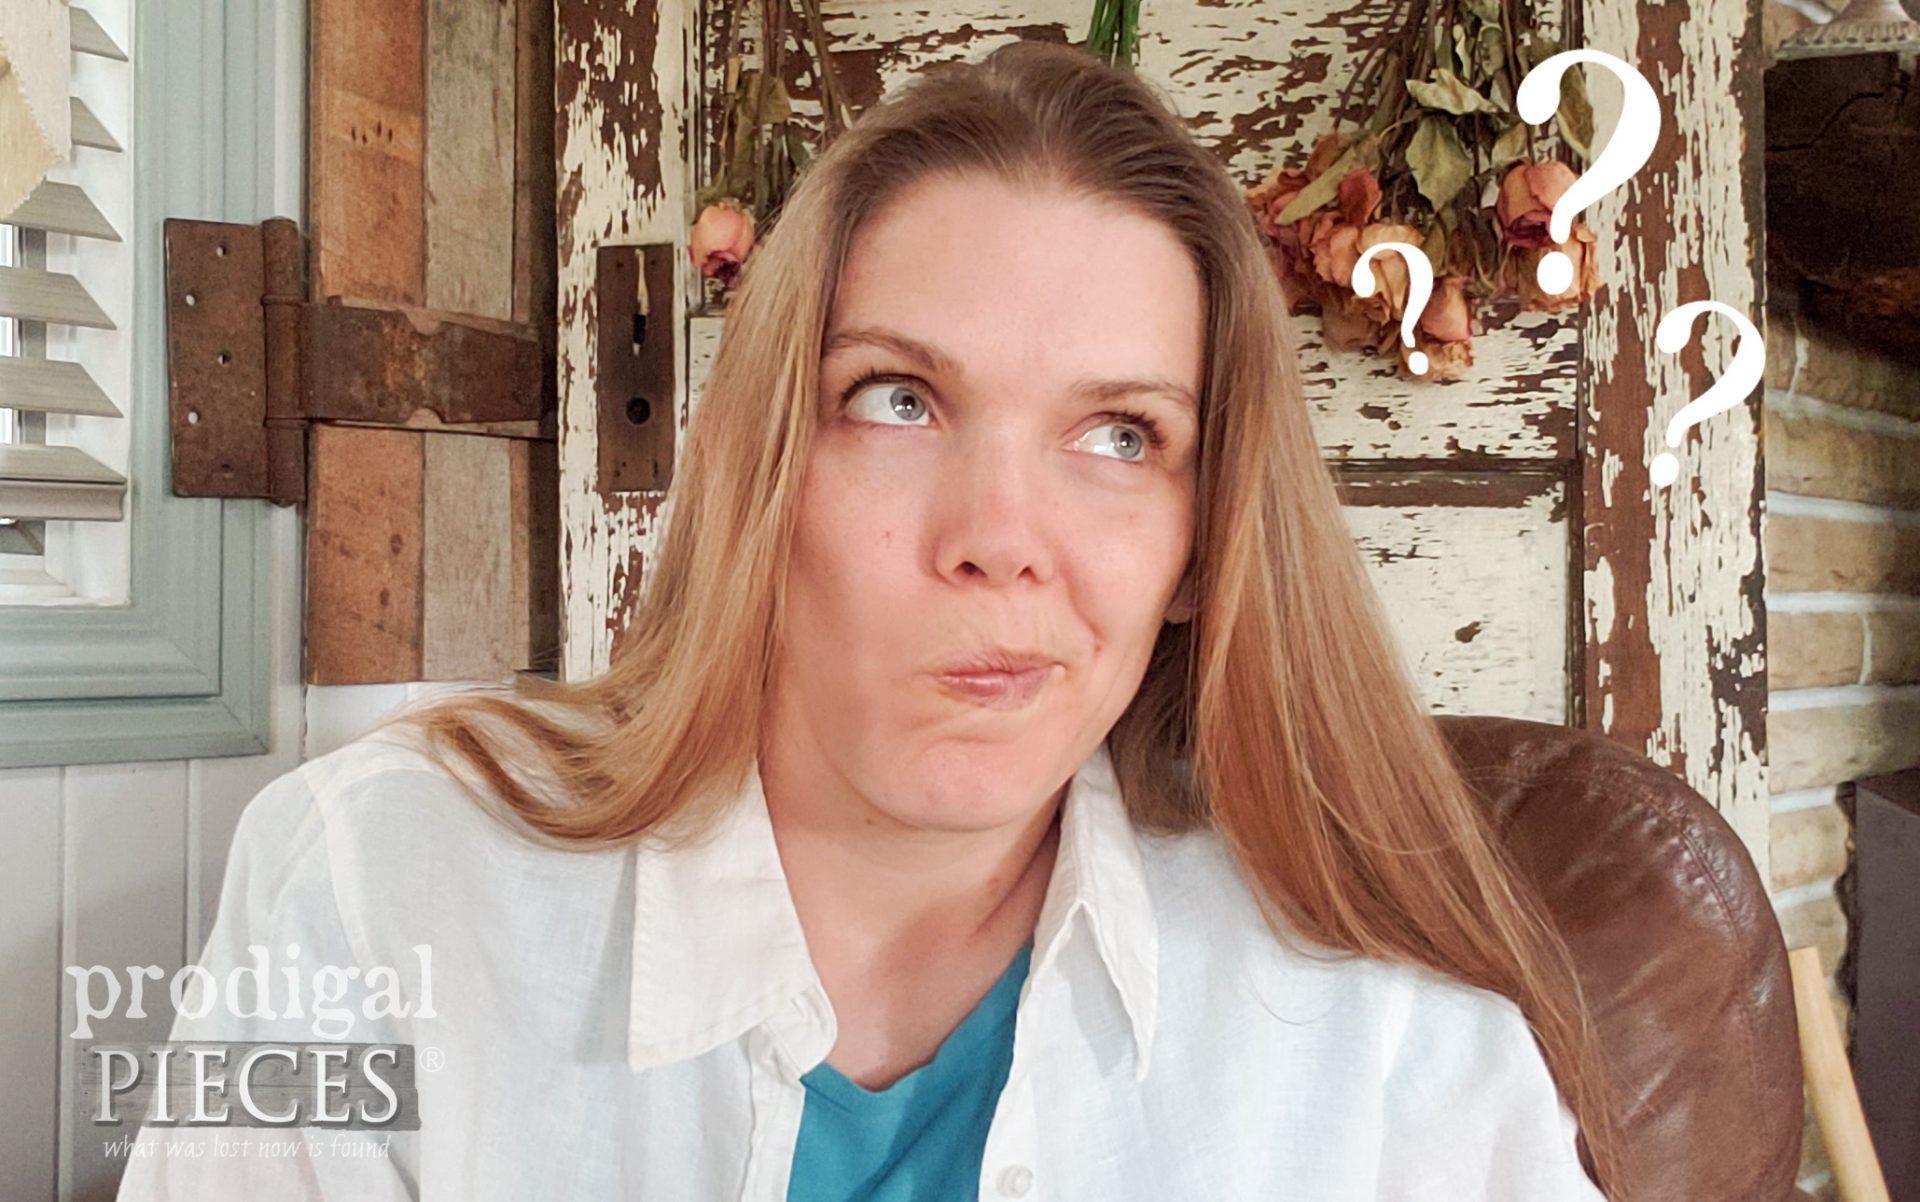 Ask Larissa of Prodigal Pieces   A fun, informative blogger interview   prodigalpieces.com #prodigalpieces #diy #blogger #interview